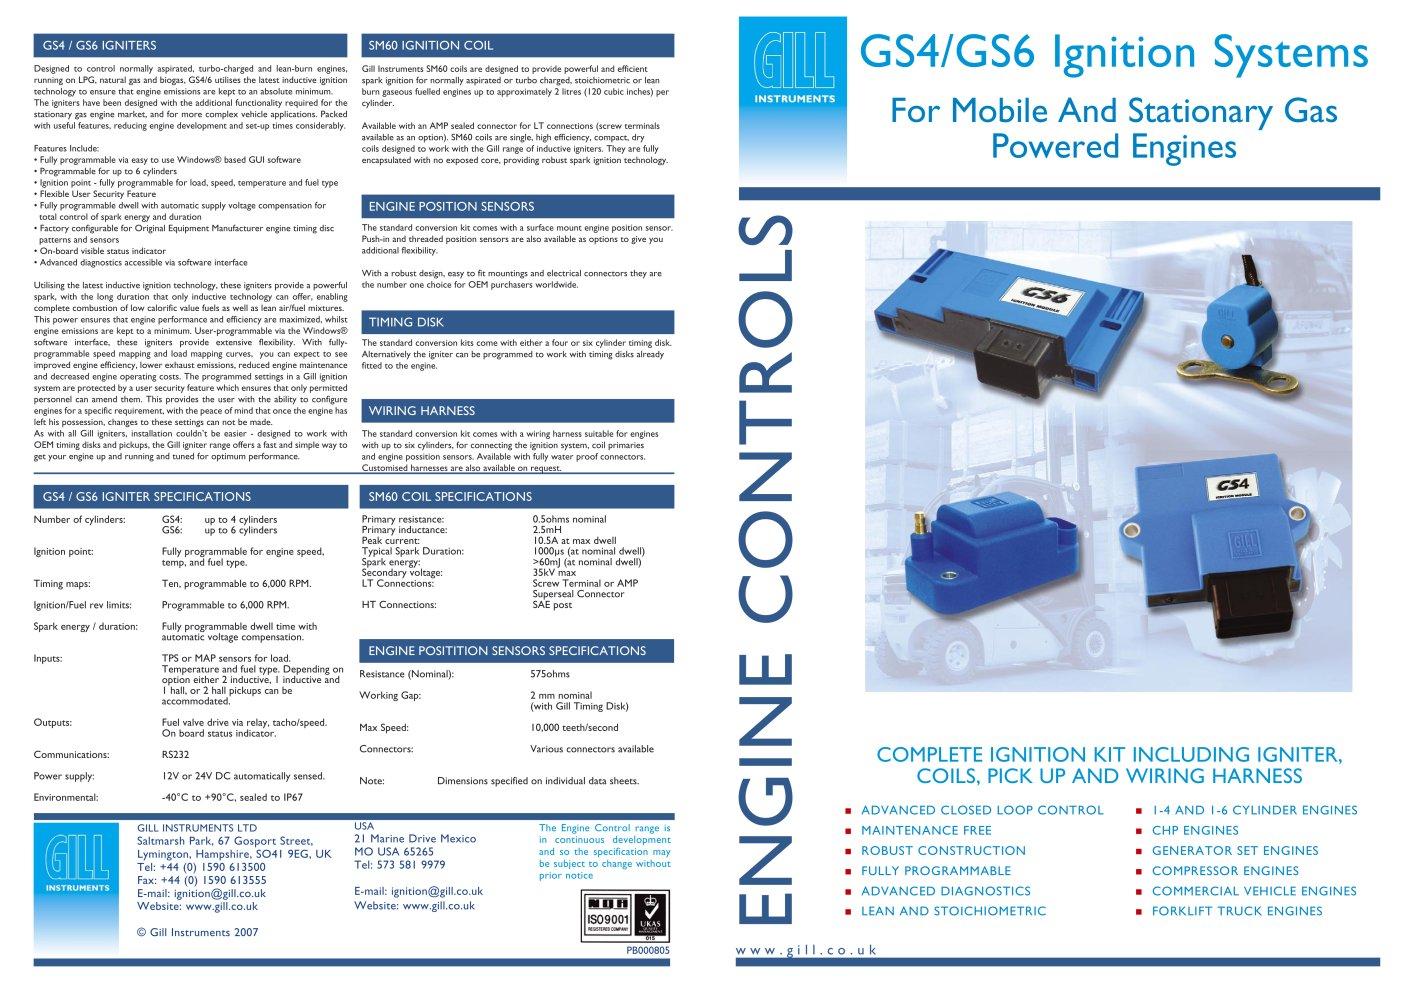 Engine Controls Brochure - Gill instruments - PDF Catalogue ...